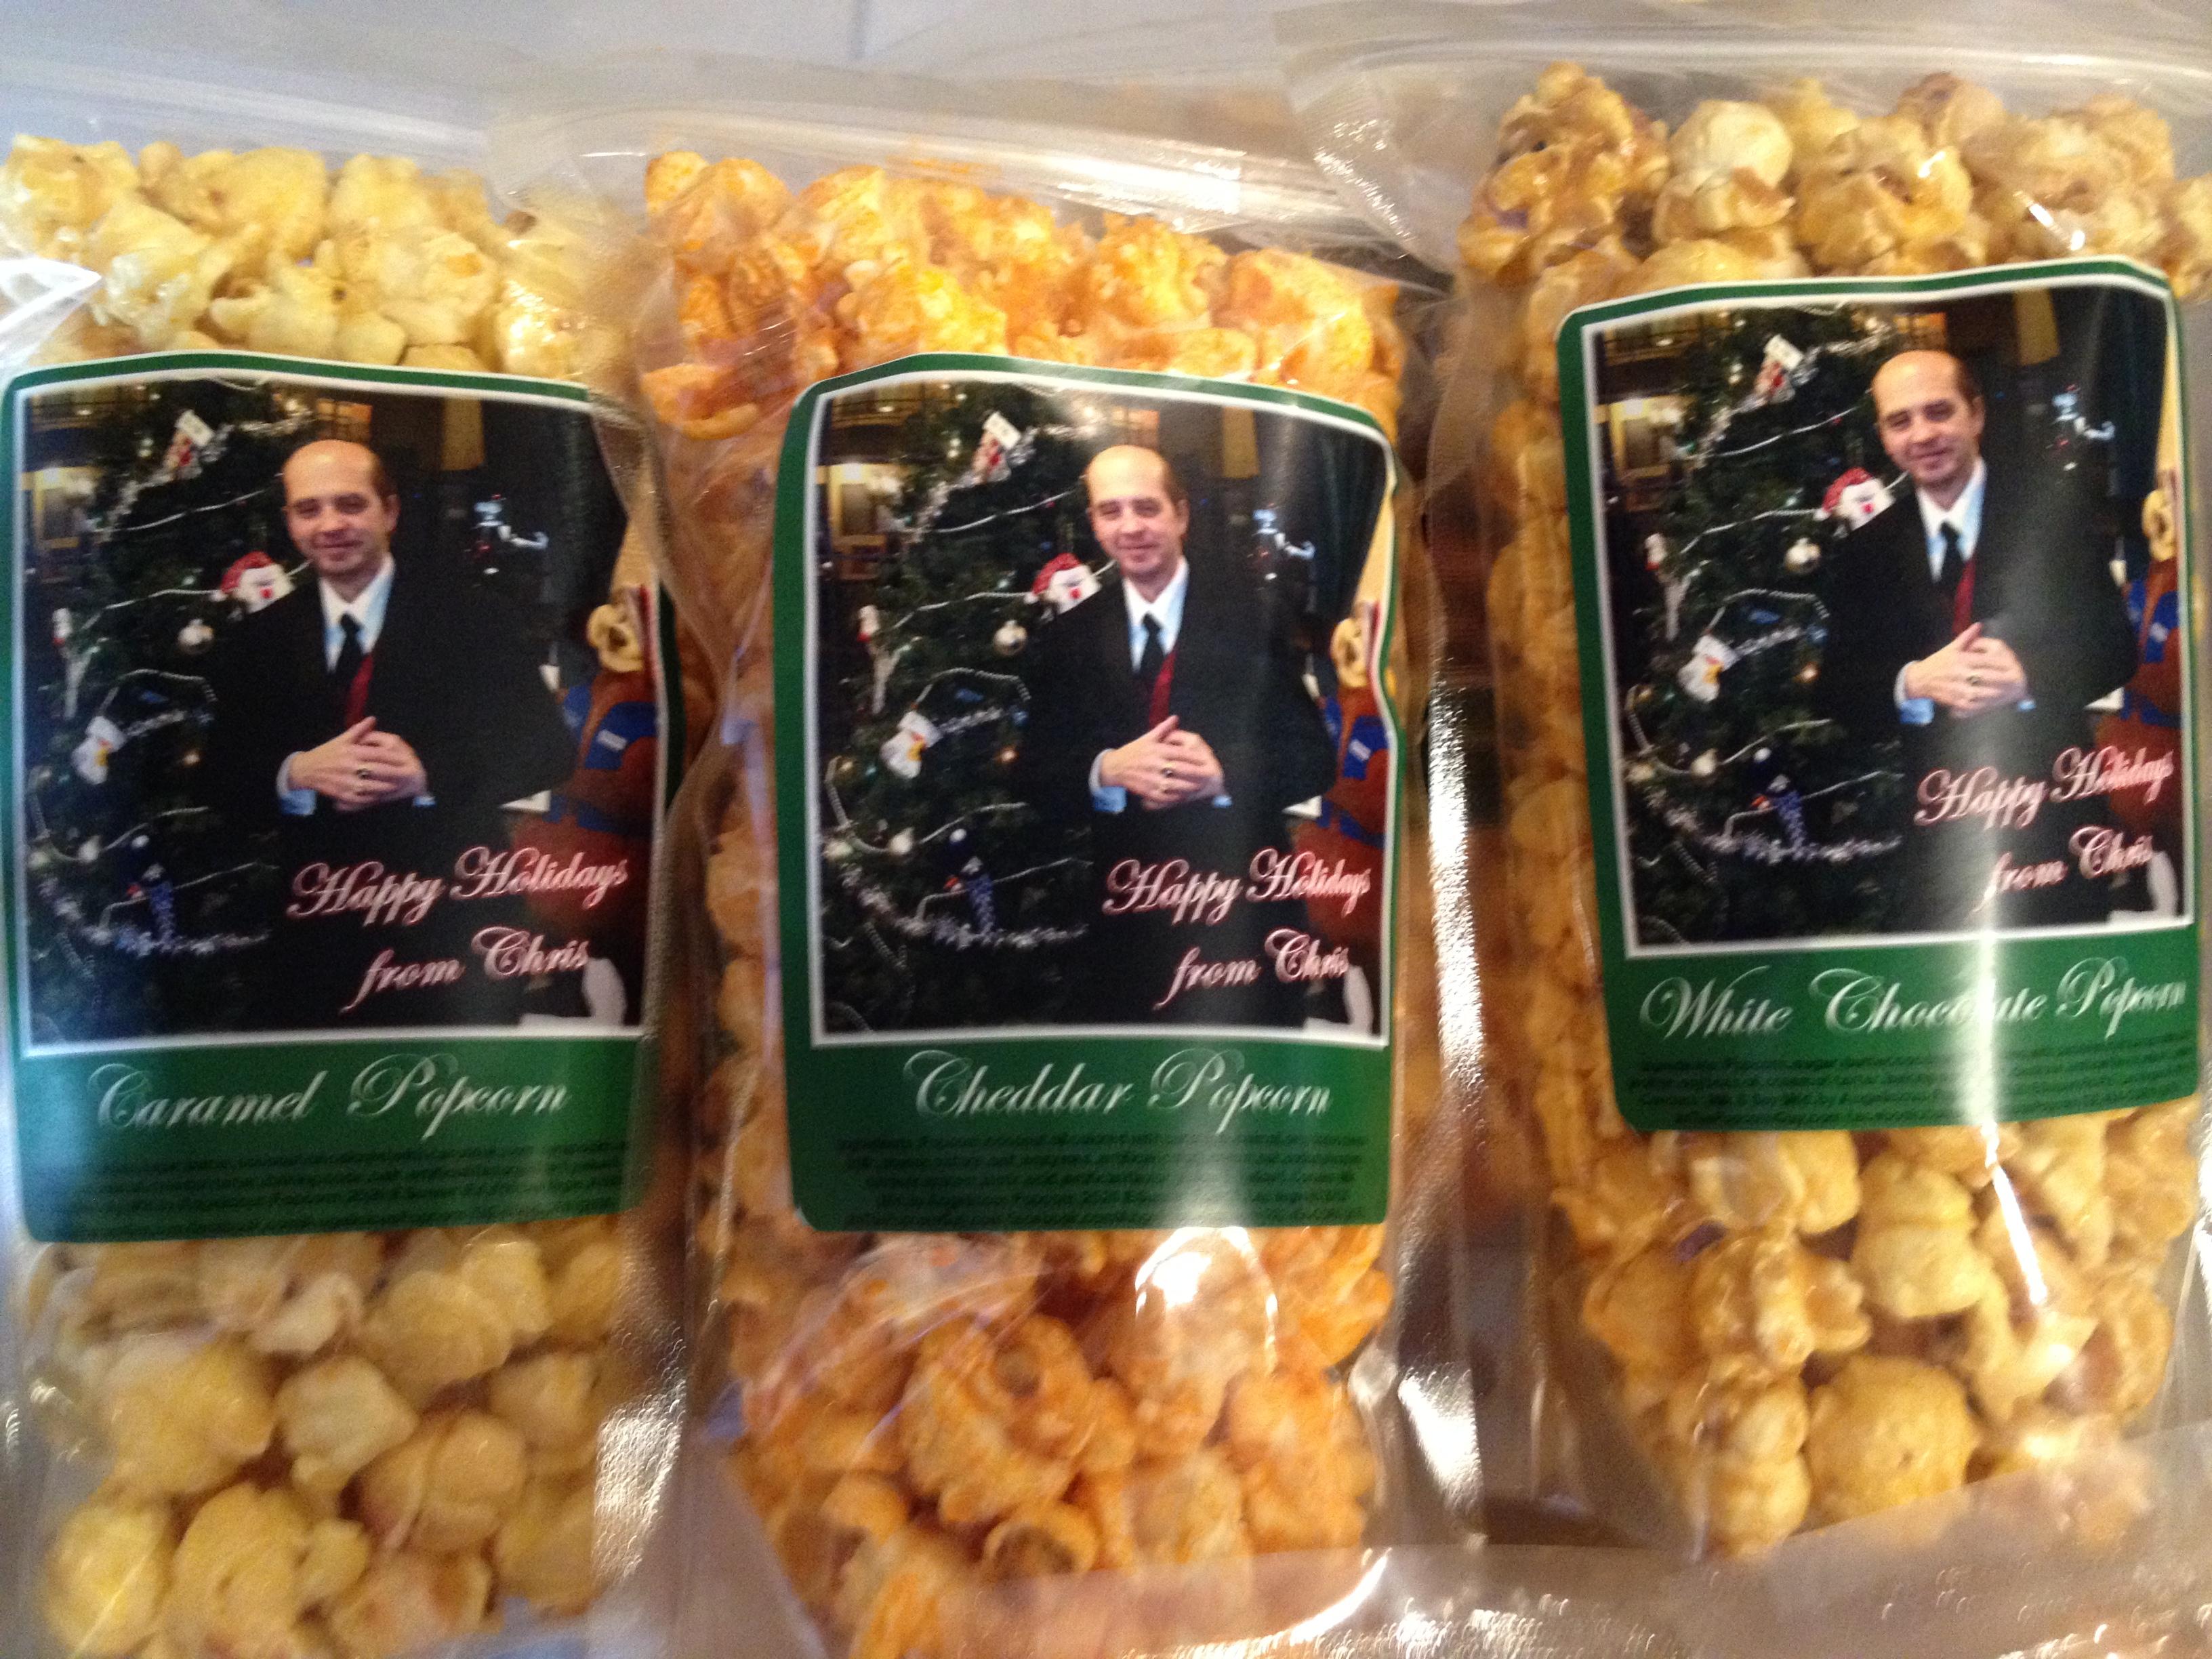 Custom bags off popcorn 21.JPG